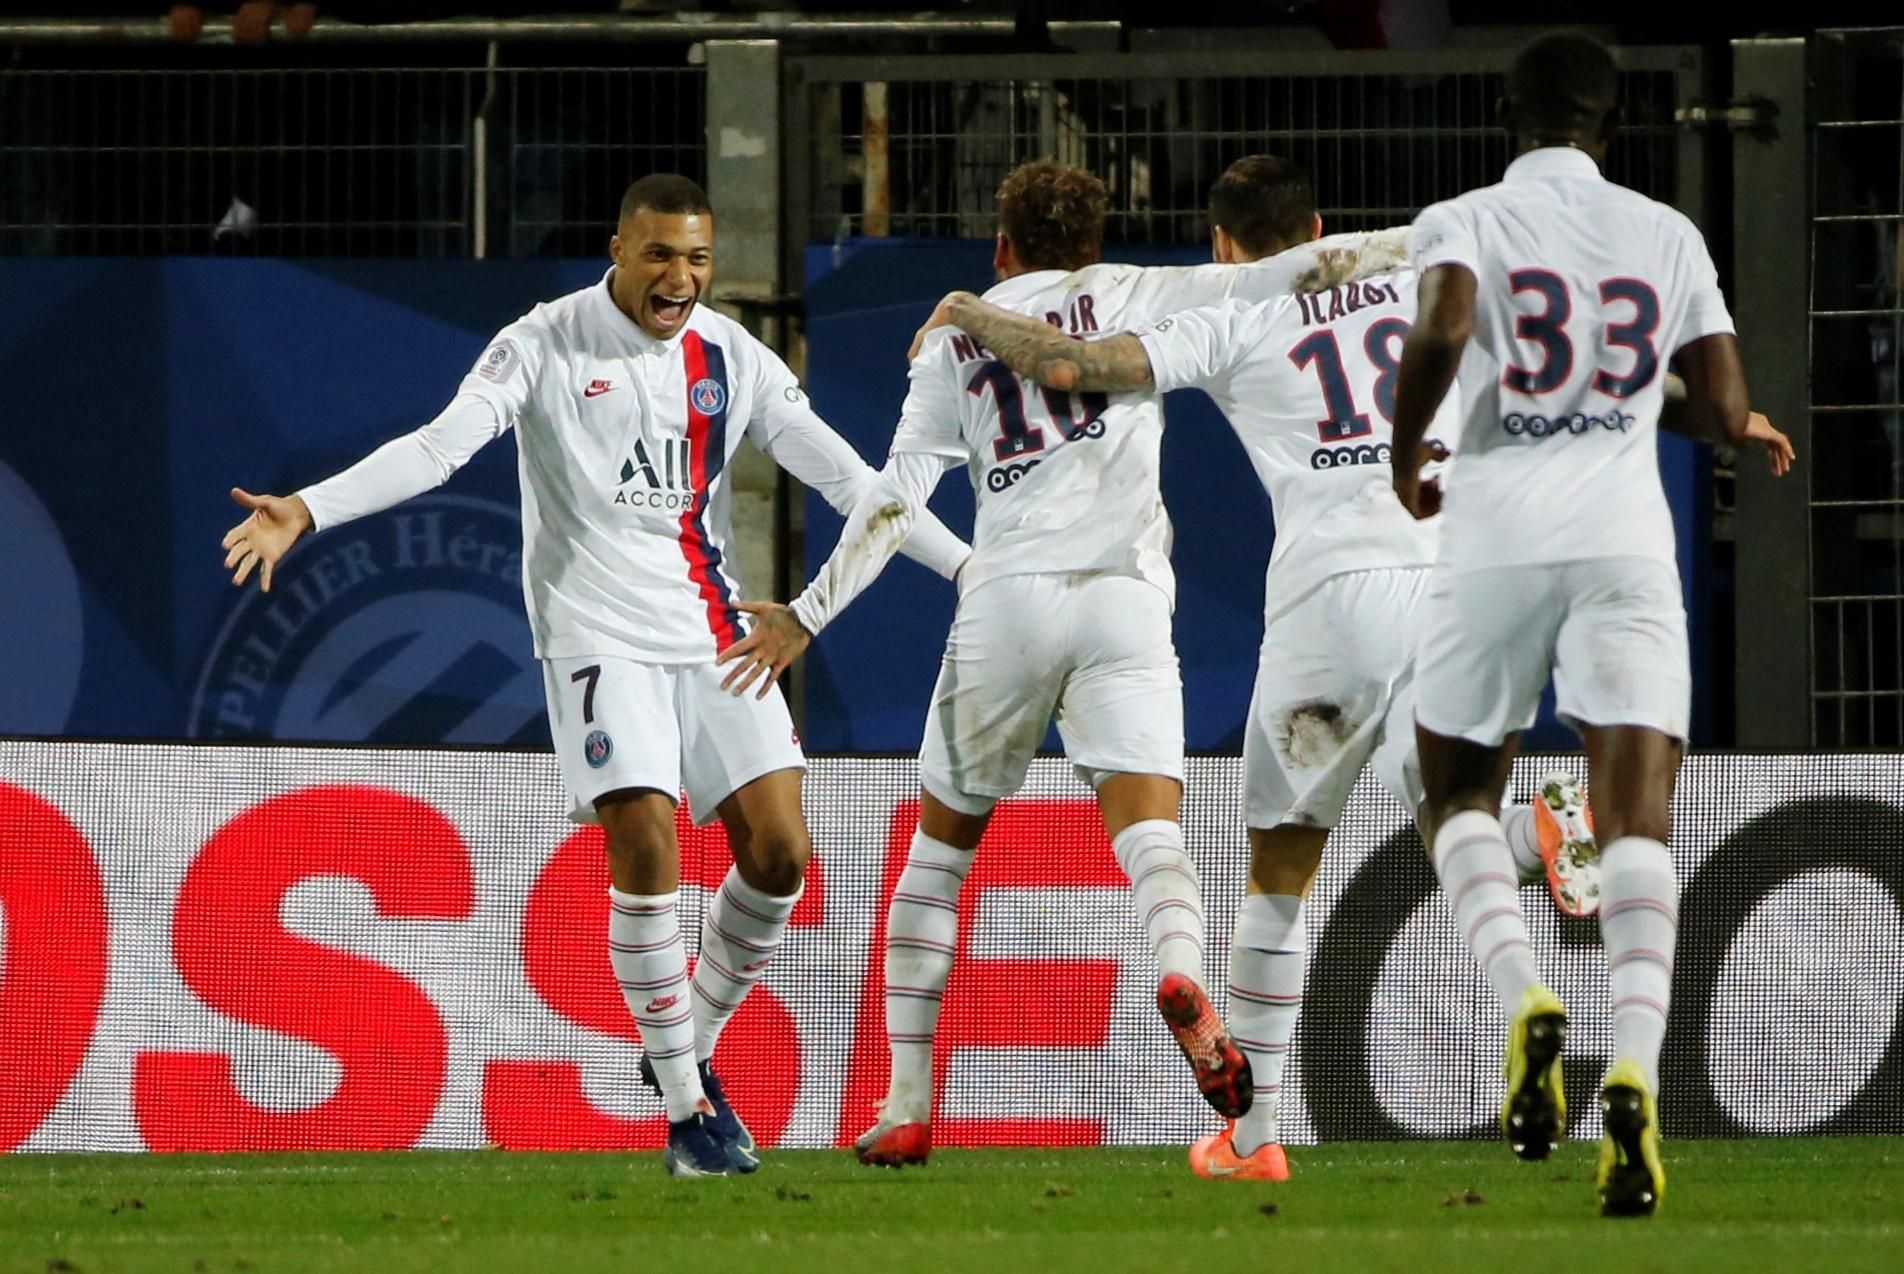 Attacking trio lead PSG to comeback win over Montpellier